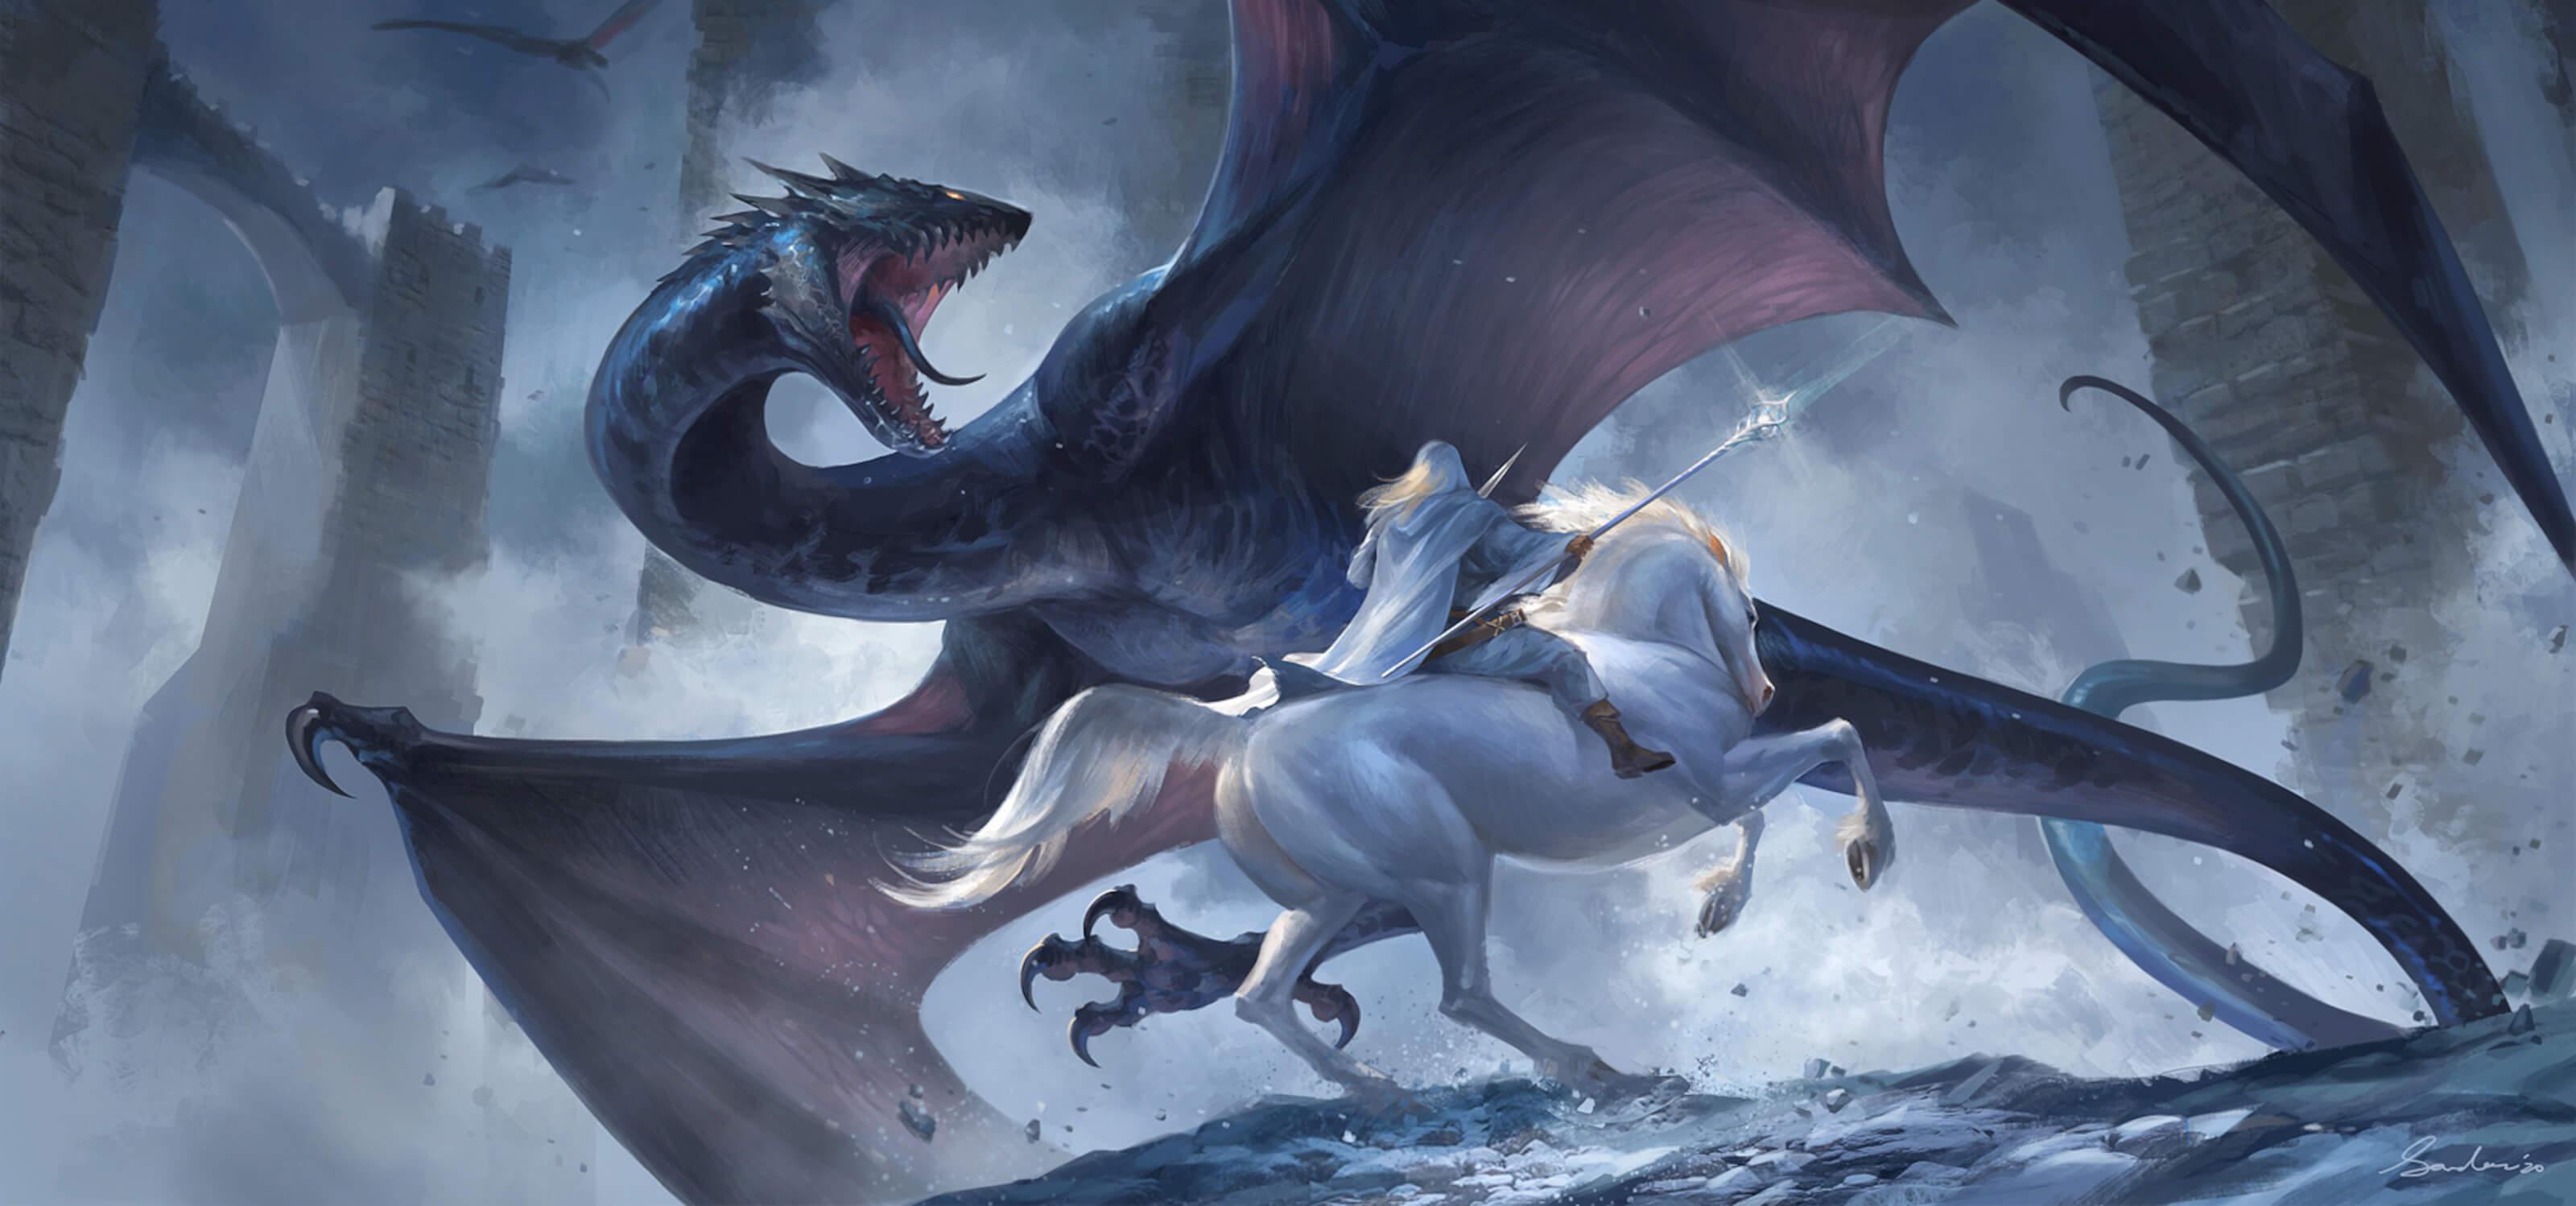 A wizard on horseback fights a wyvern-like beast, by Sandara Tang.